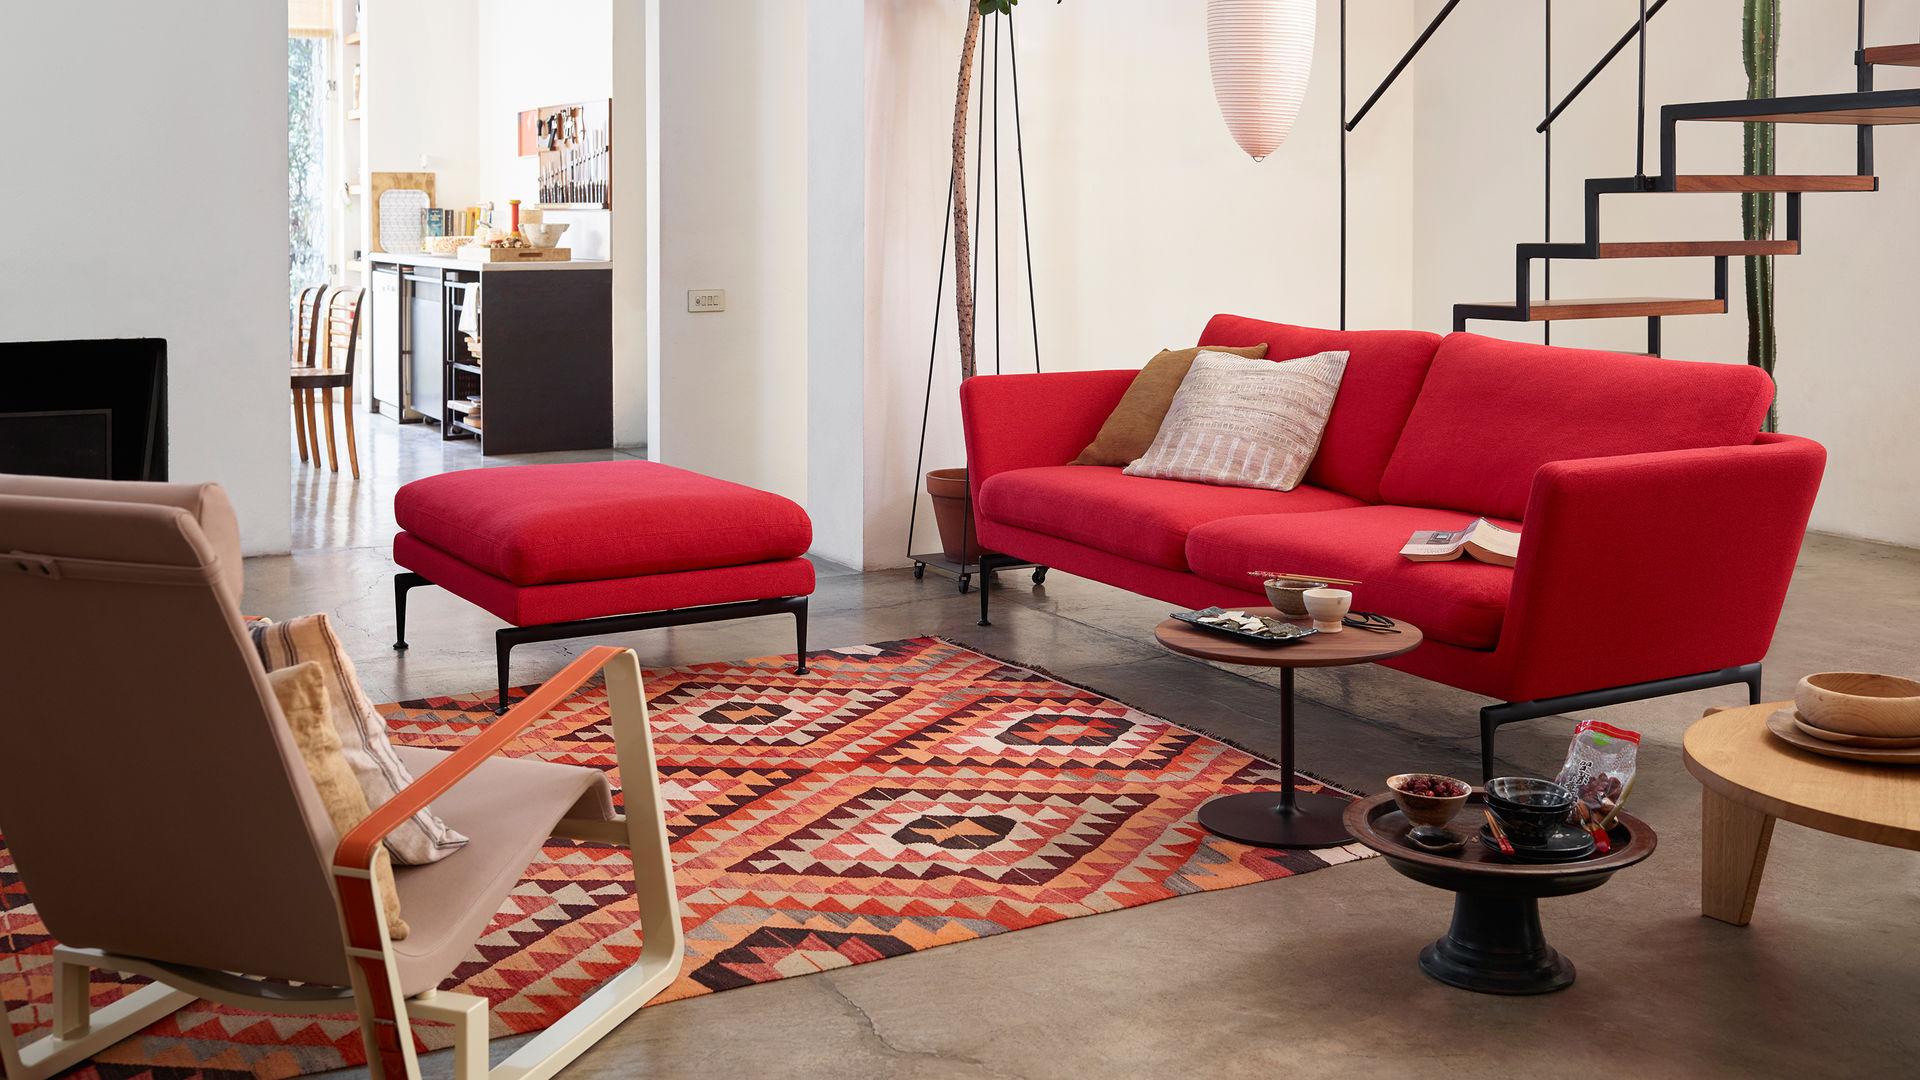 vitra suita sofa 3 seater. Black Bedroom Furniture Sets. Home Design Ideas